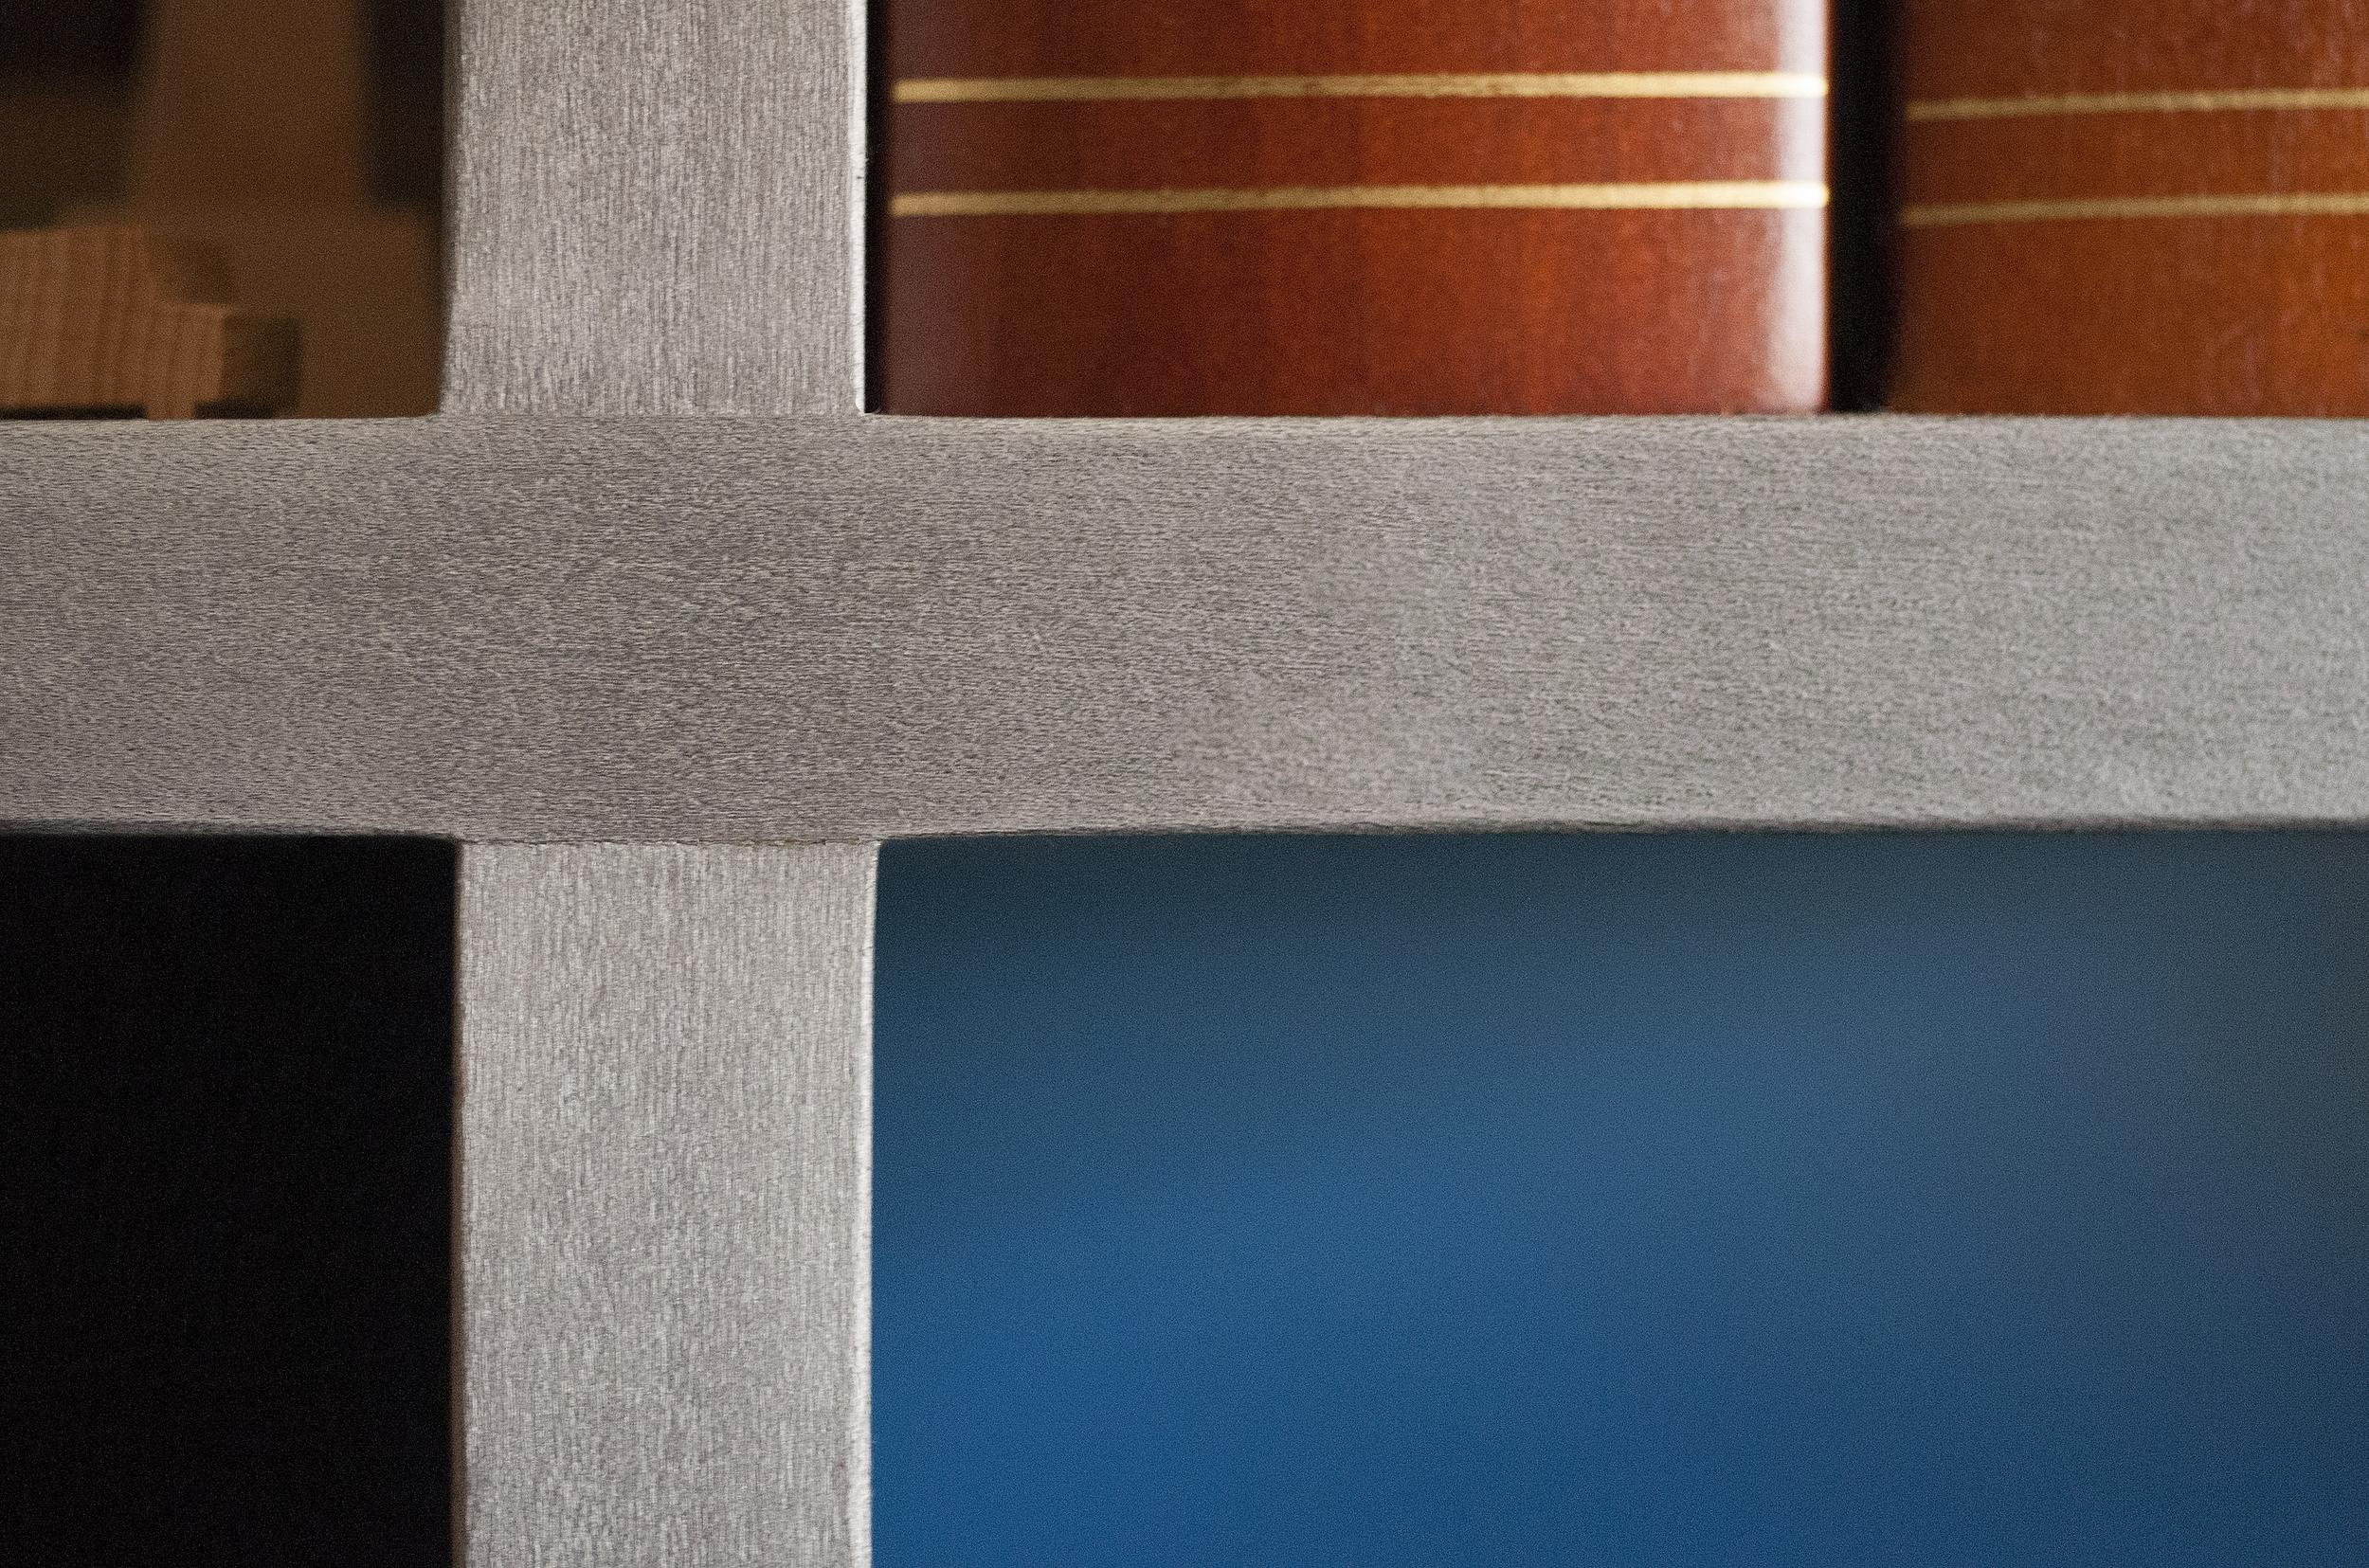 JeffersonShelf-Detail2.jpg